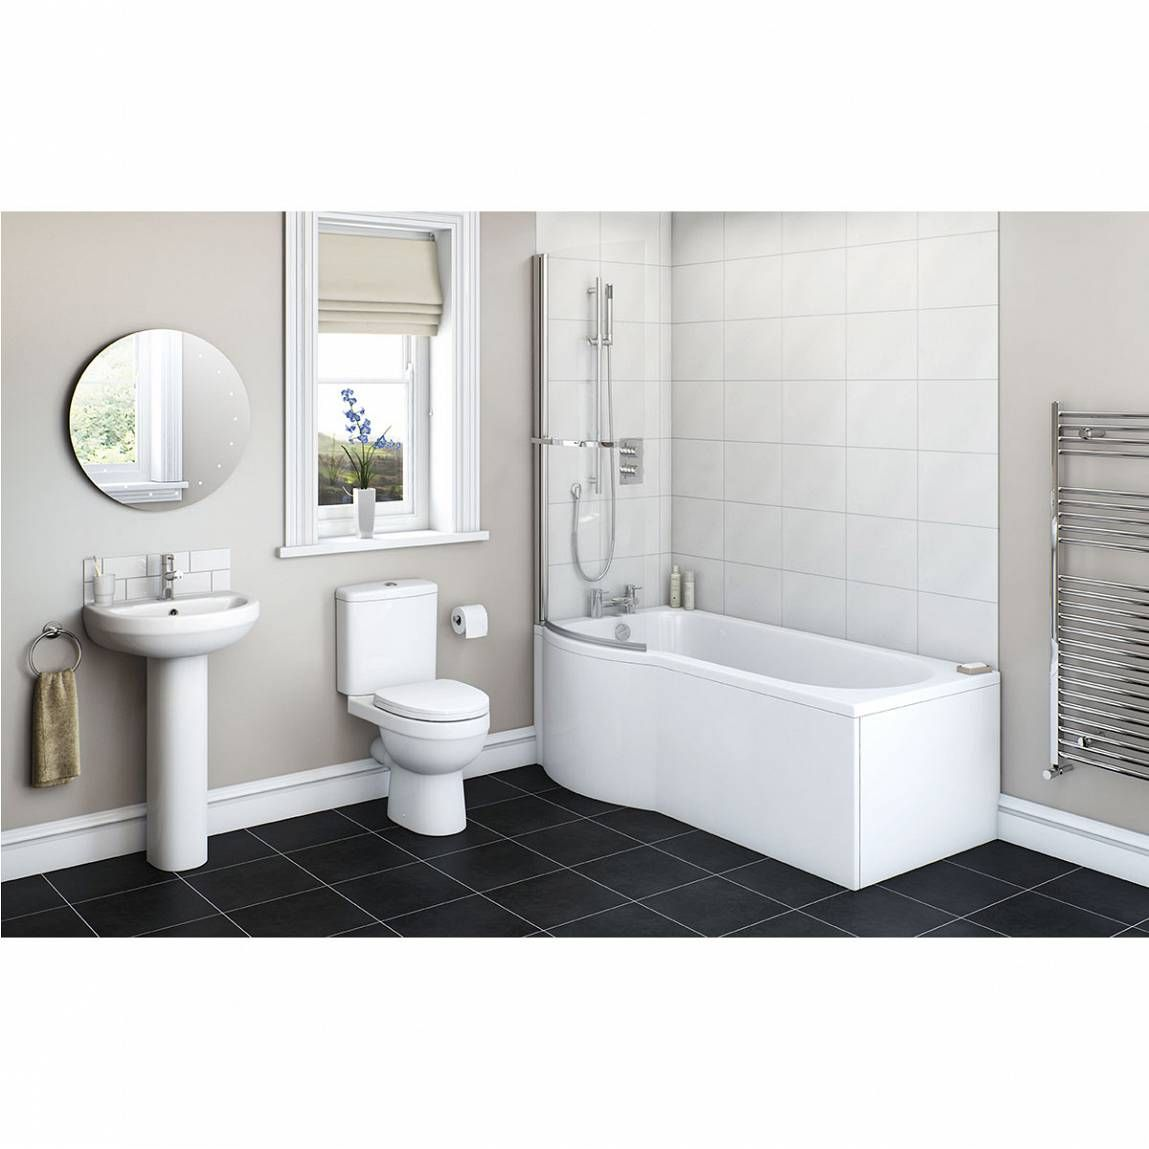 Plumbs bathroom suites - Energy Bathroom Suite With Evesham 1700 X 850 Shower Bath Lh Victoria Plumb